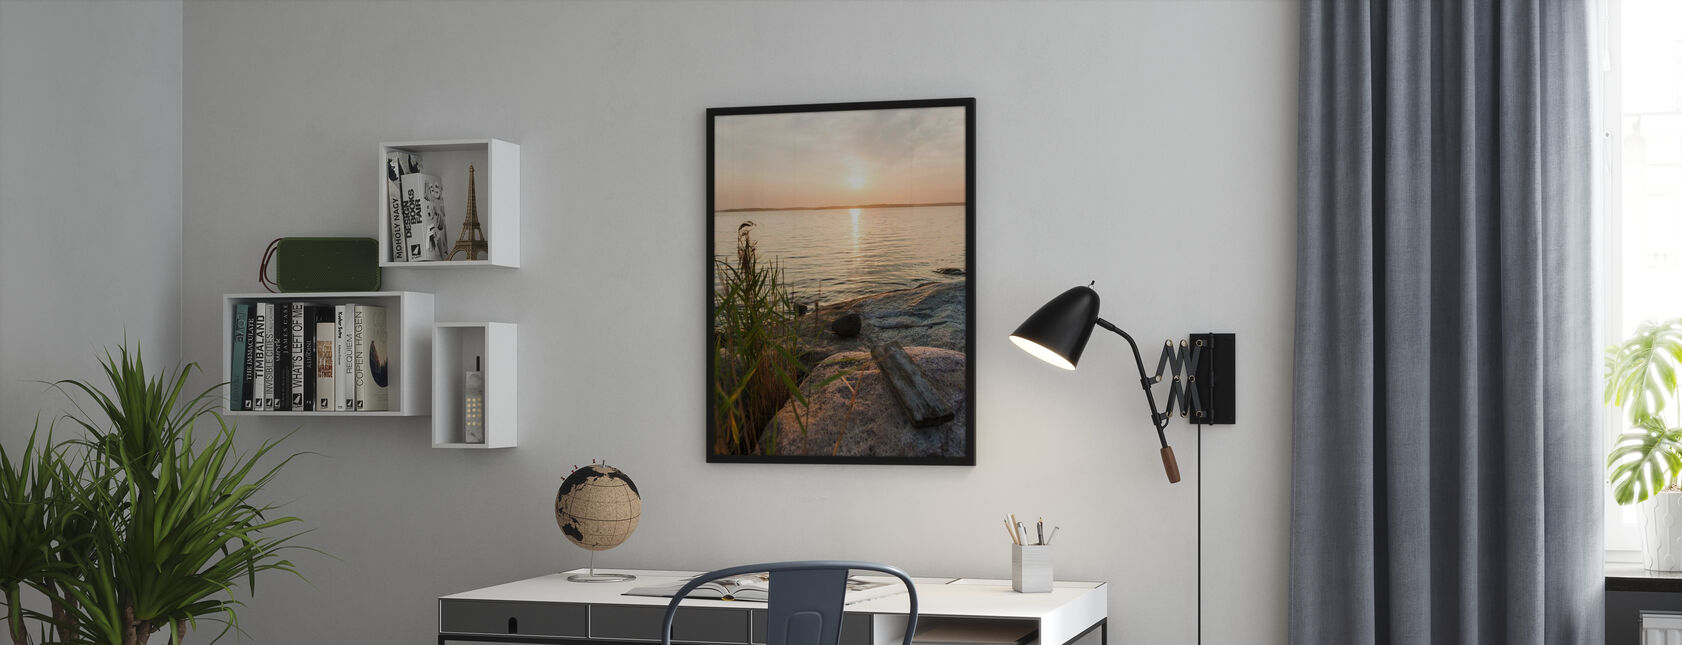 Sunset over Nässlingen, Sweden - Poster - Büro